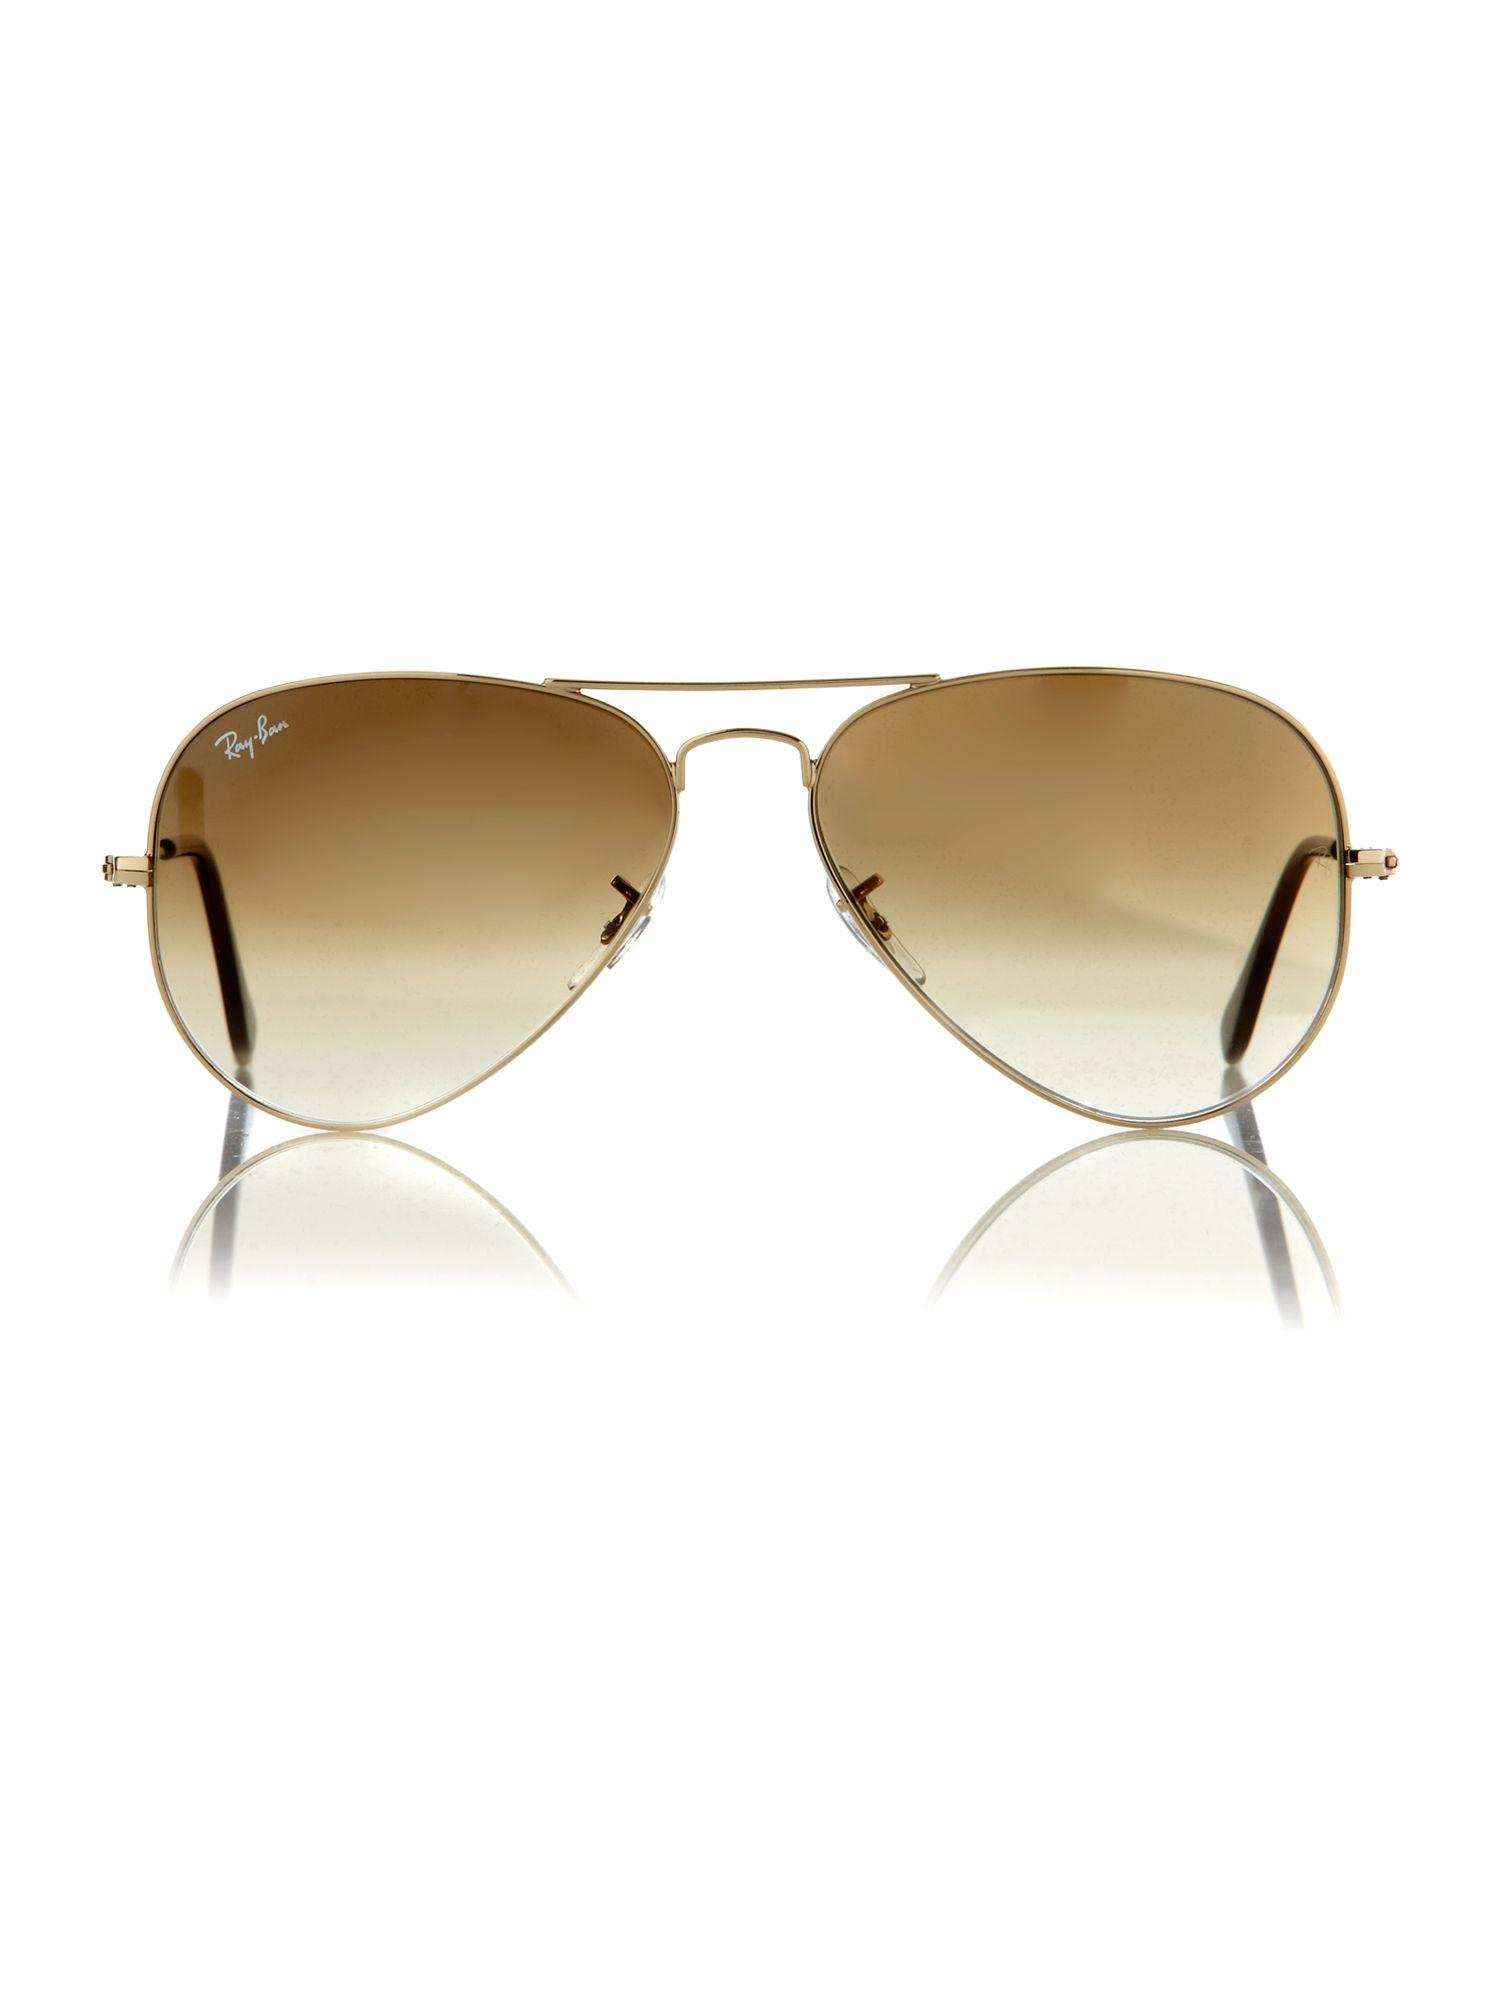 a1c320e6a1 Arista Ray Bans Aviator Sunglasses « Heritage Malta